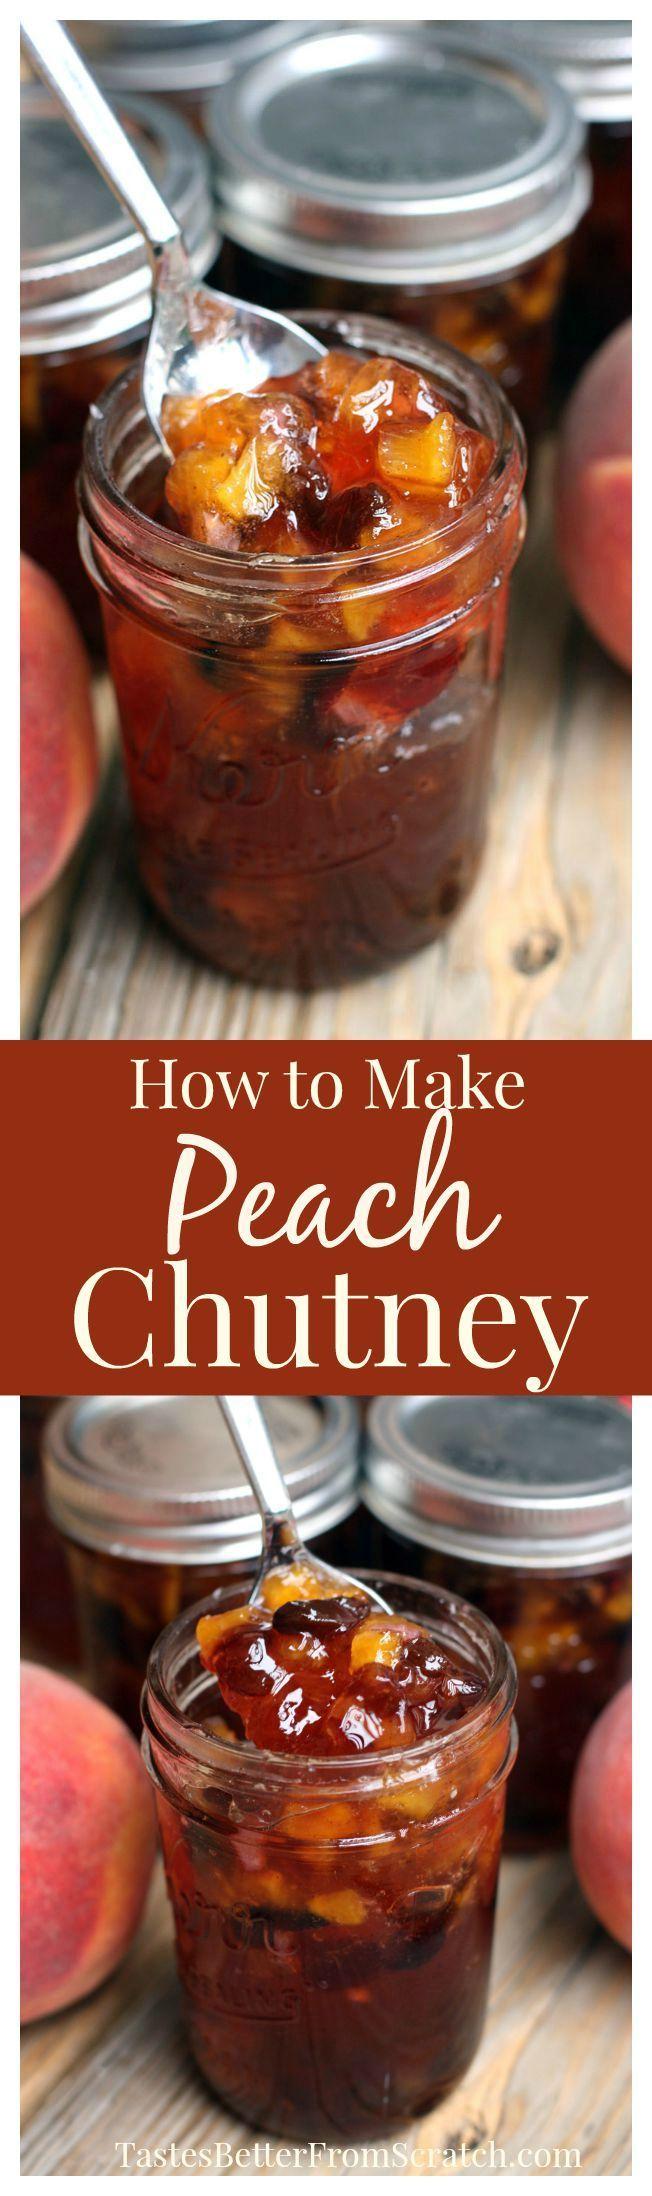 Homemade Peach Chutney is like